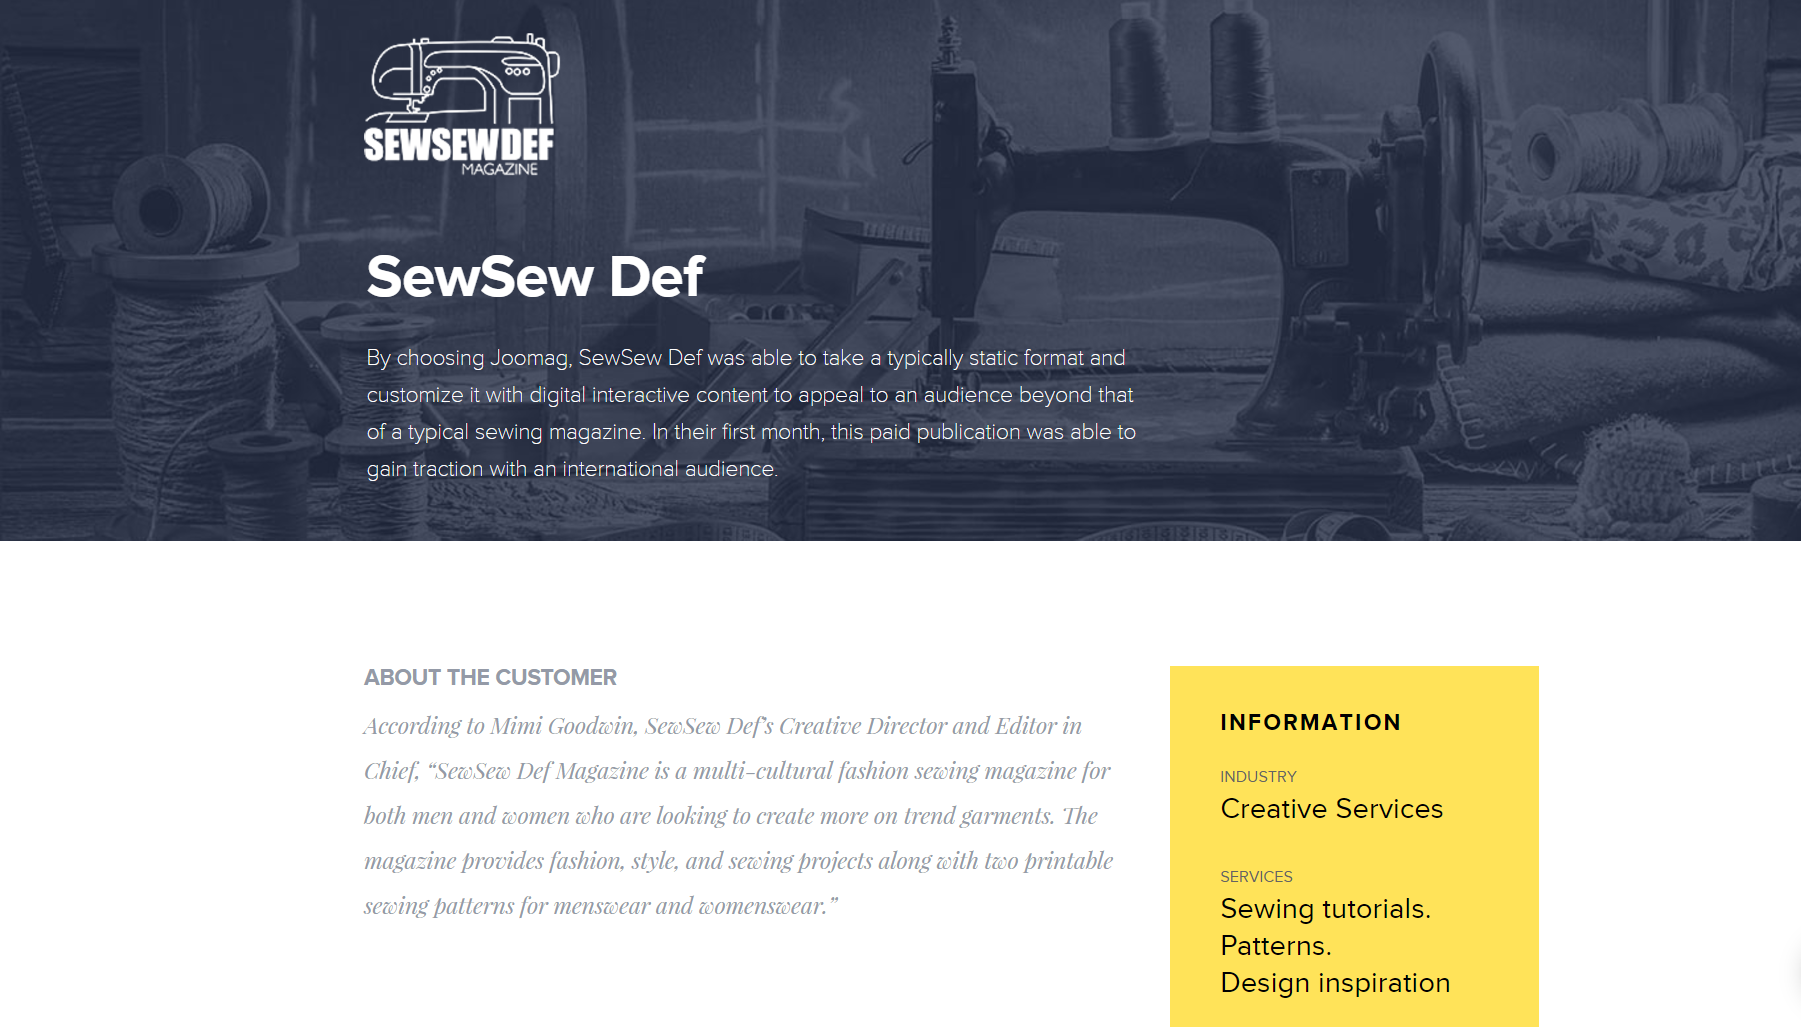 Sewsew Def